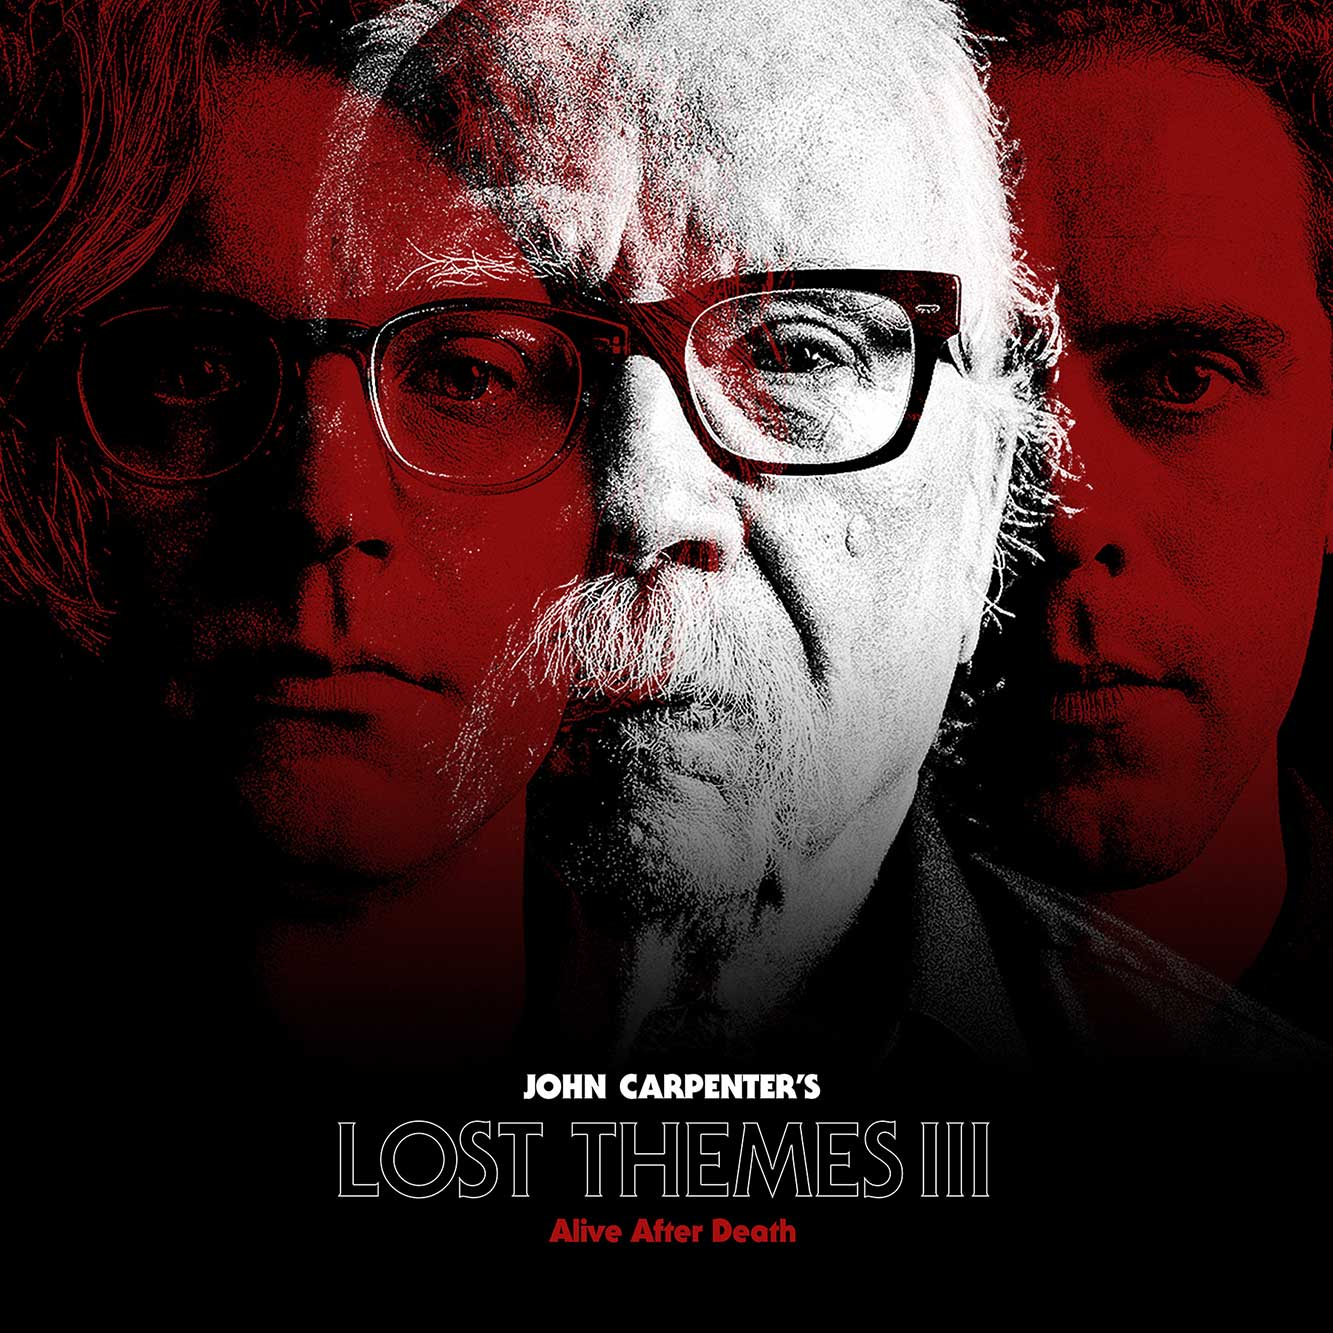 John Carpenter's Lost Themes II Alive After Dark